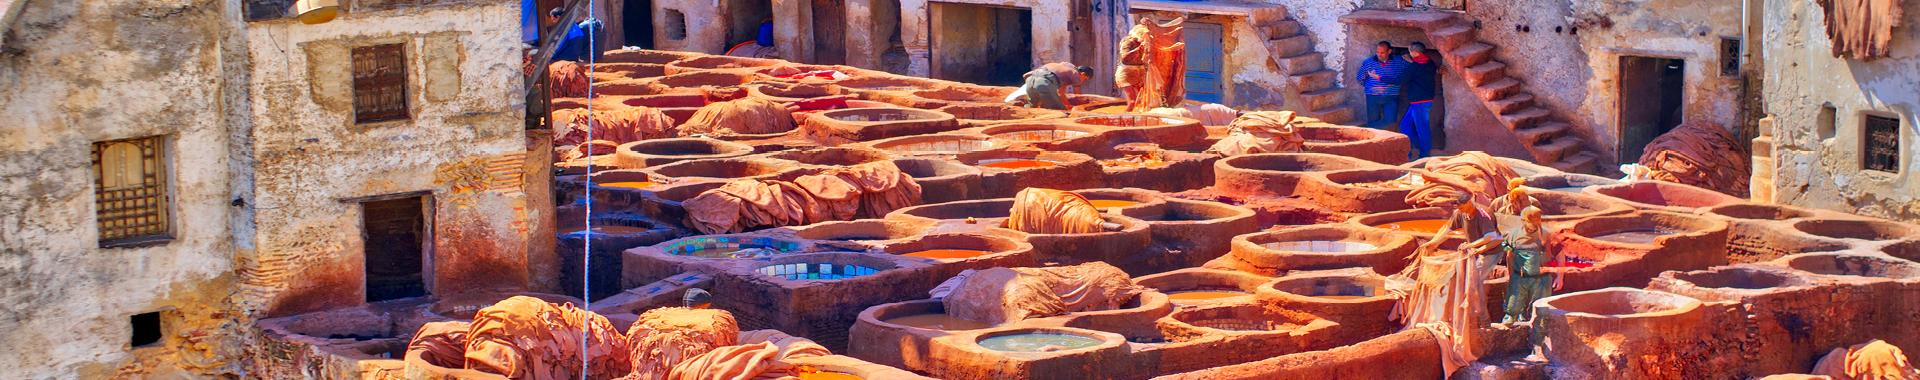 Morocco-Fes/Trey Ratcliff